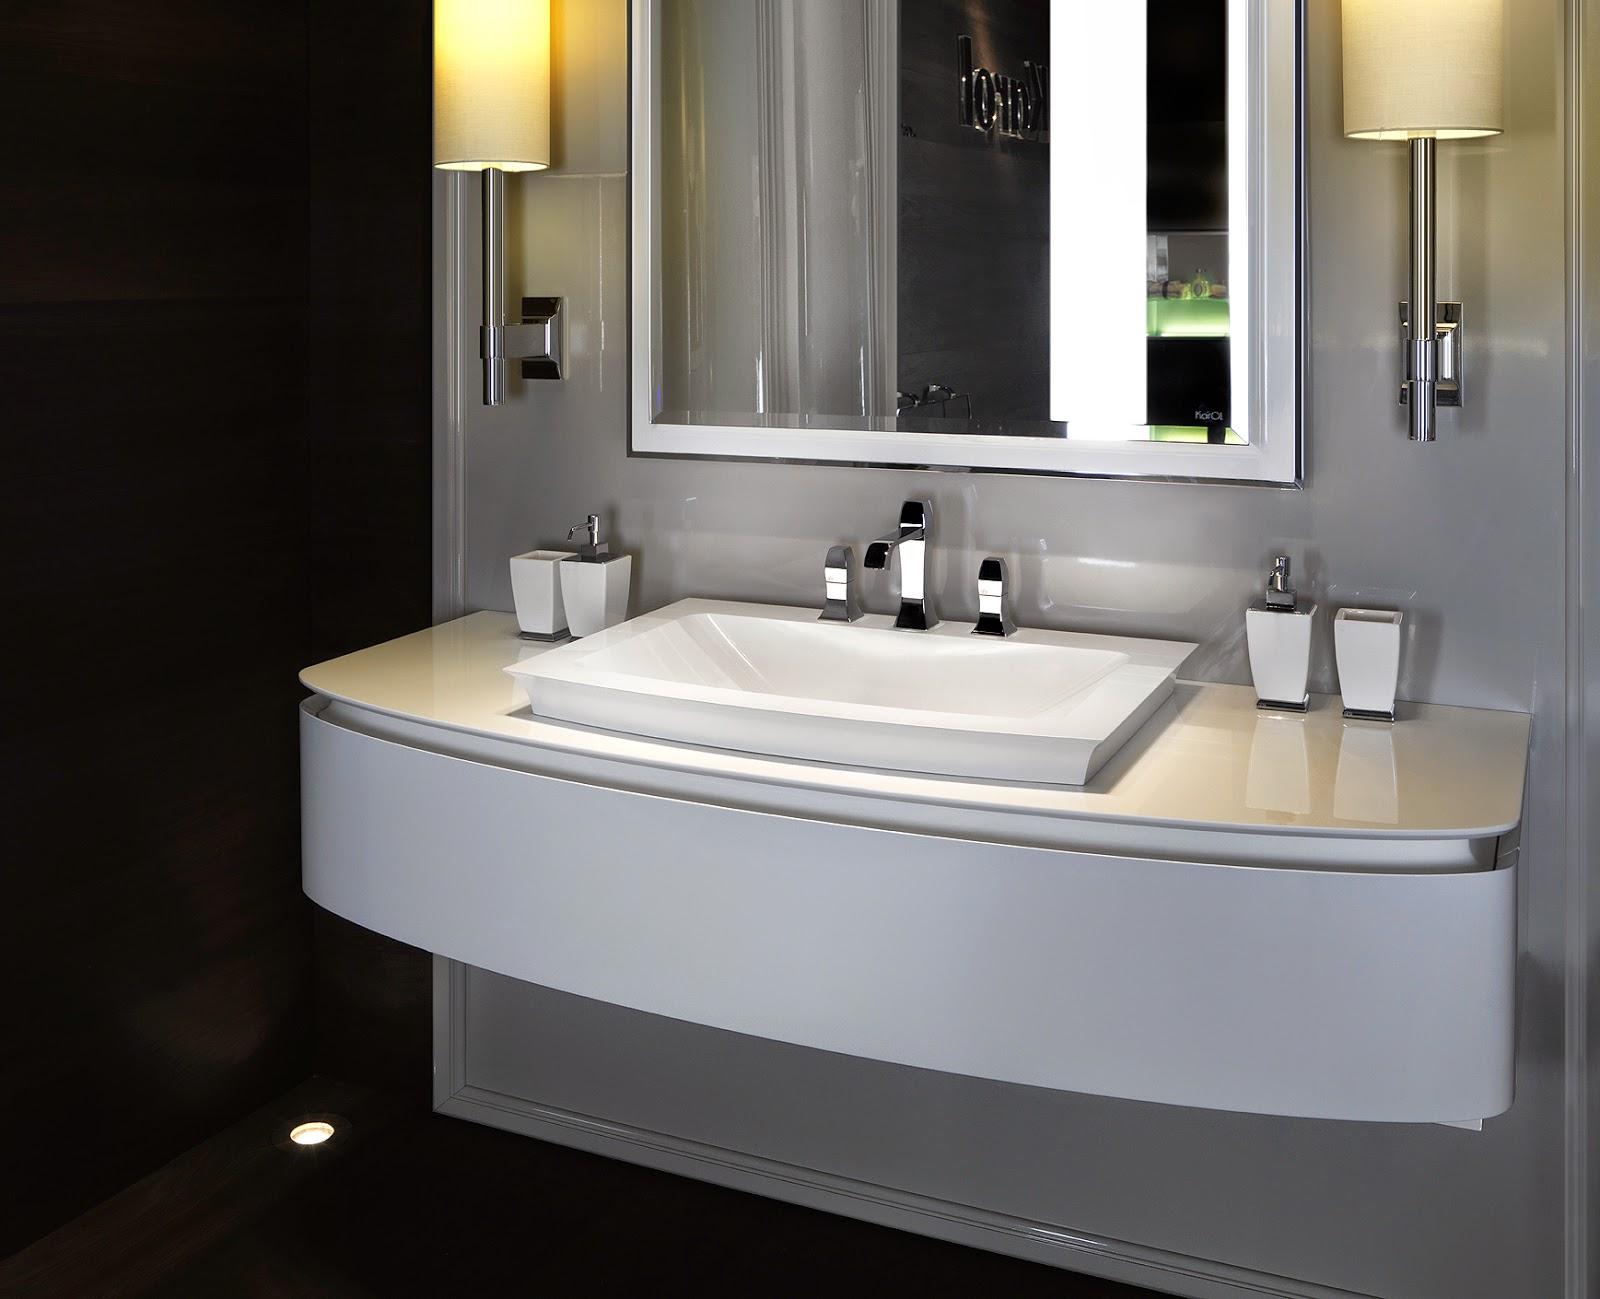 Bania mueble de baño Karol